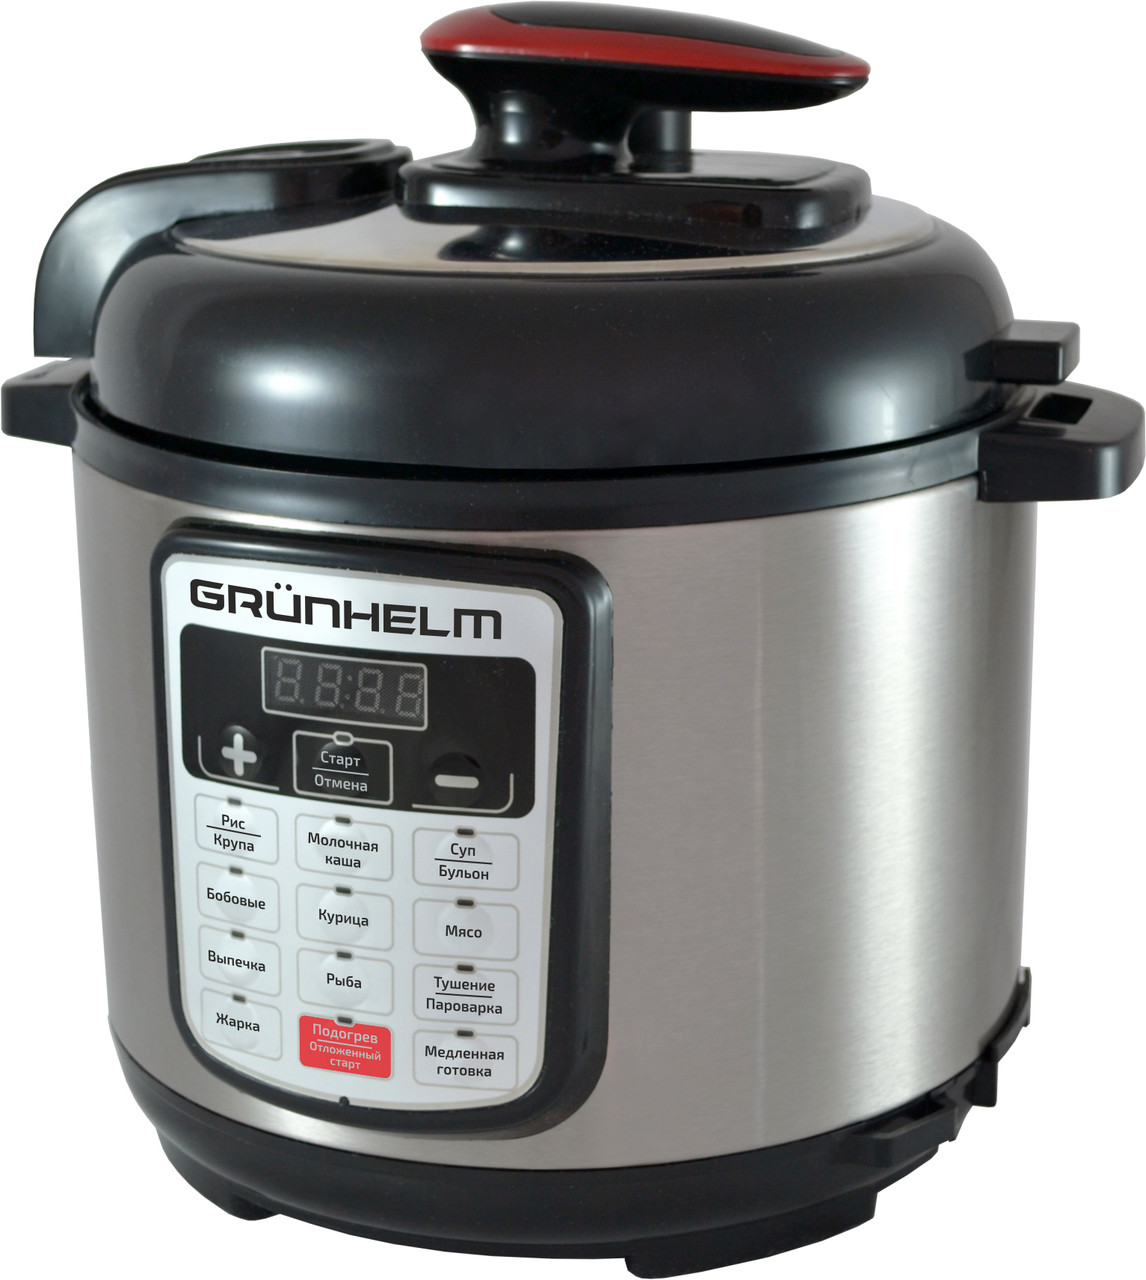 Мультиварка-скороварка GRUNHELM MРC-15В,13 программ,4 литра 900Вт ( Гарантийный срок 24 мес )